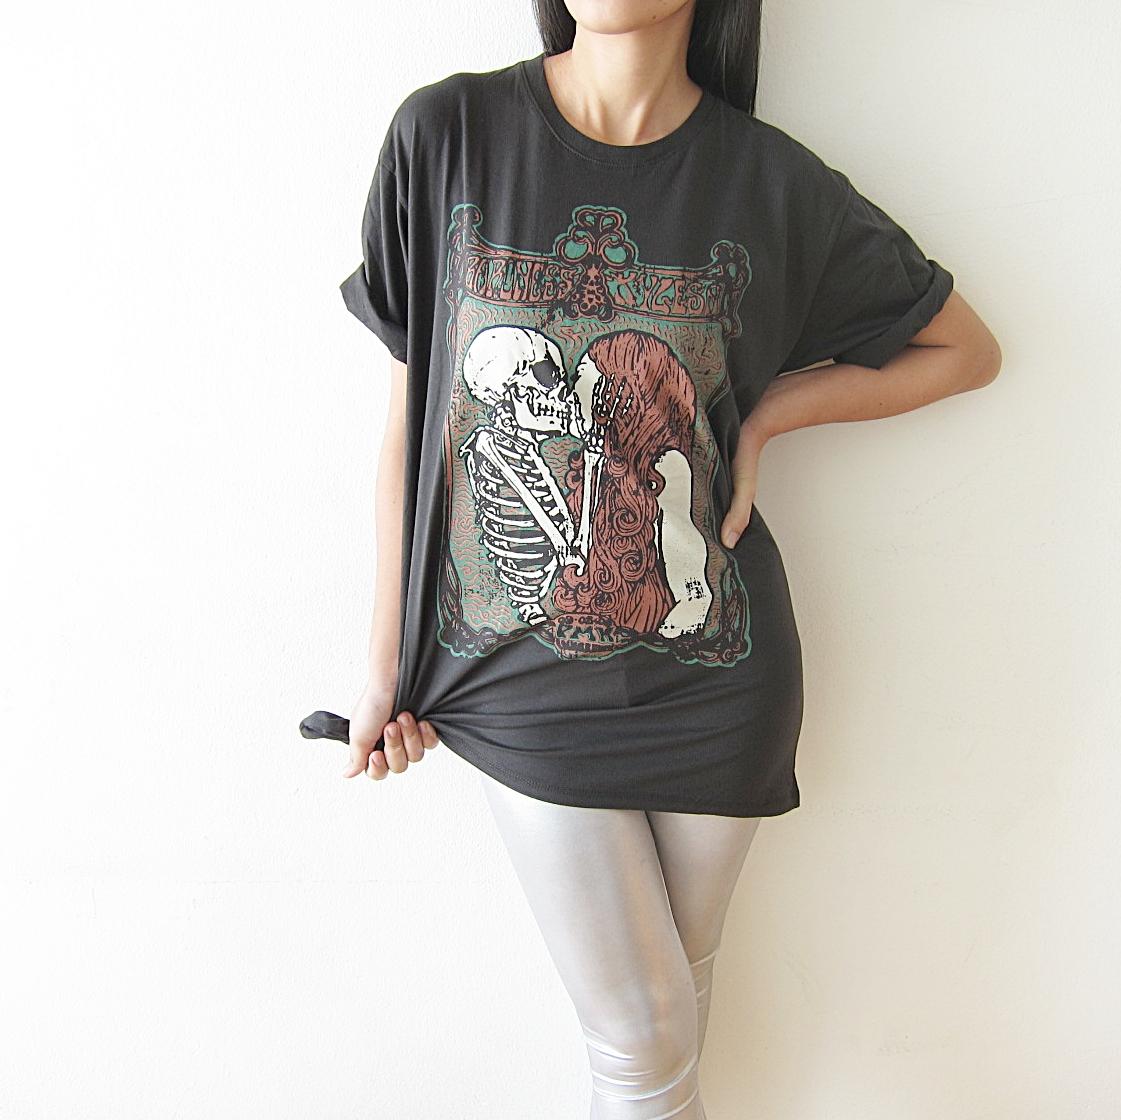 skull_kiss_girl_punk_rock_gothic_t_shirt_size_m_l_tees_2.JPG